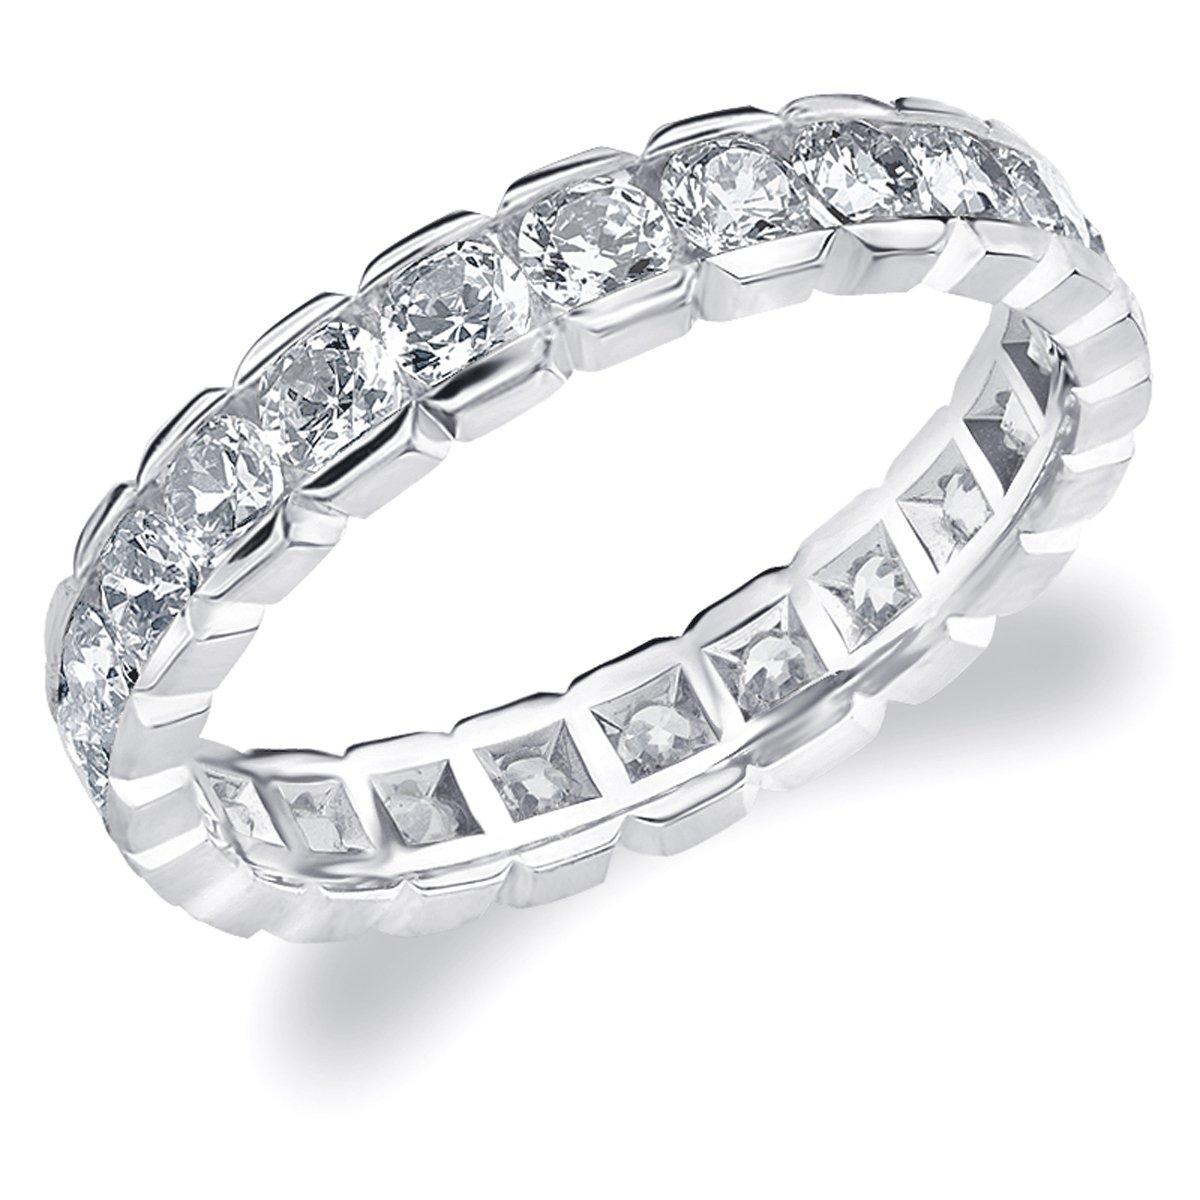 1.50 CT Eternity Ring in 10K White Gold, Diamond Box Set Eternity Wedding Band Anniversary Ring Size 9.5